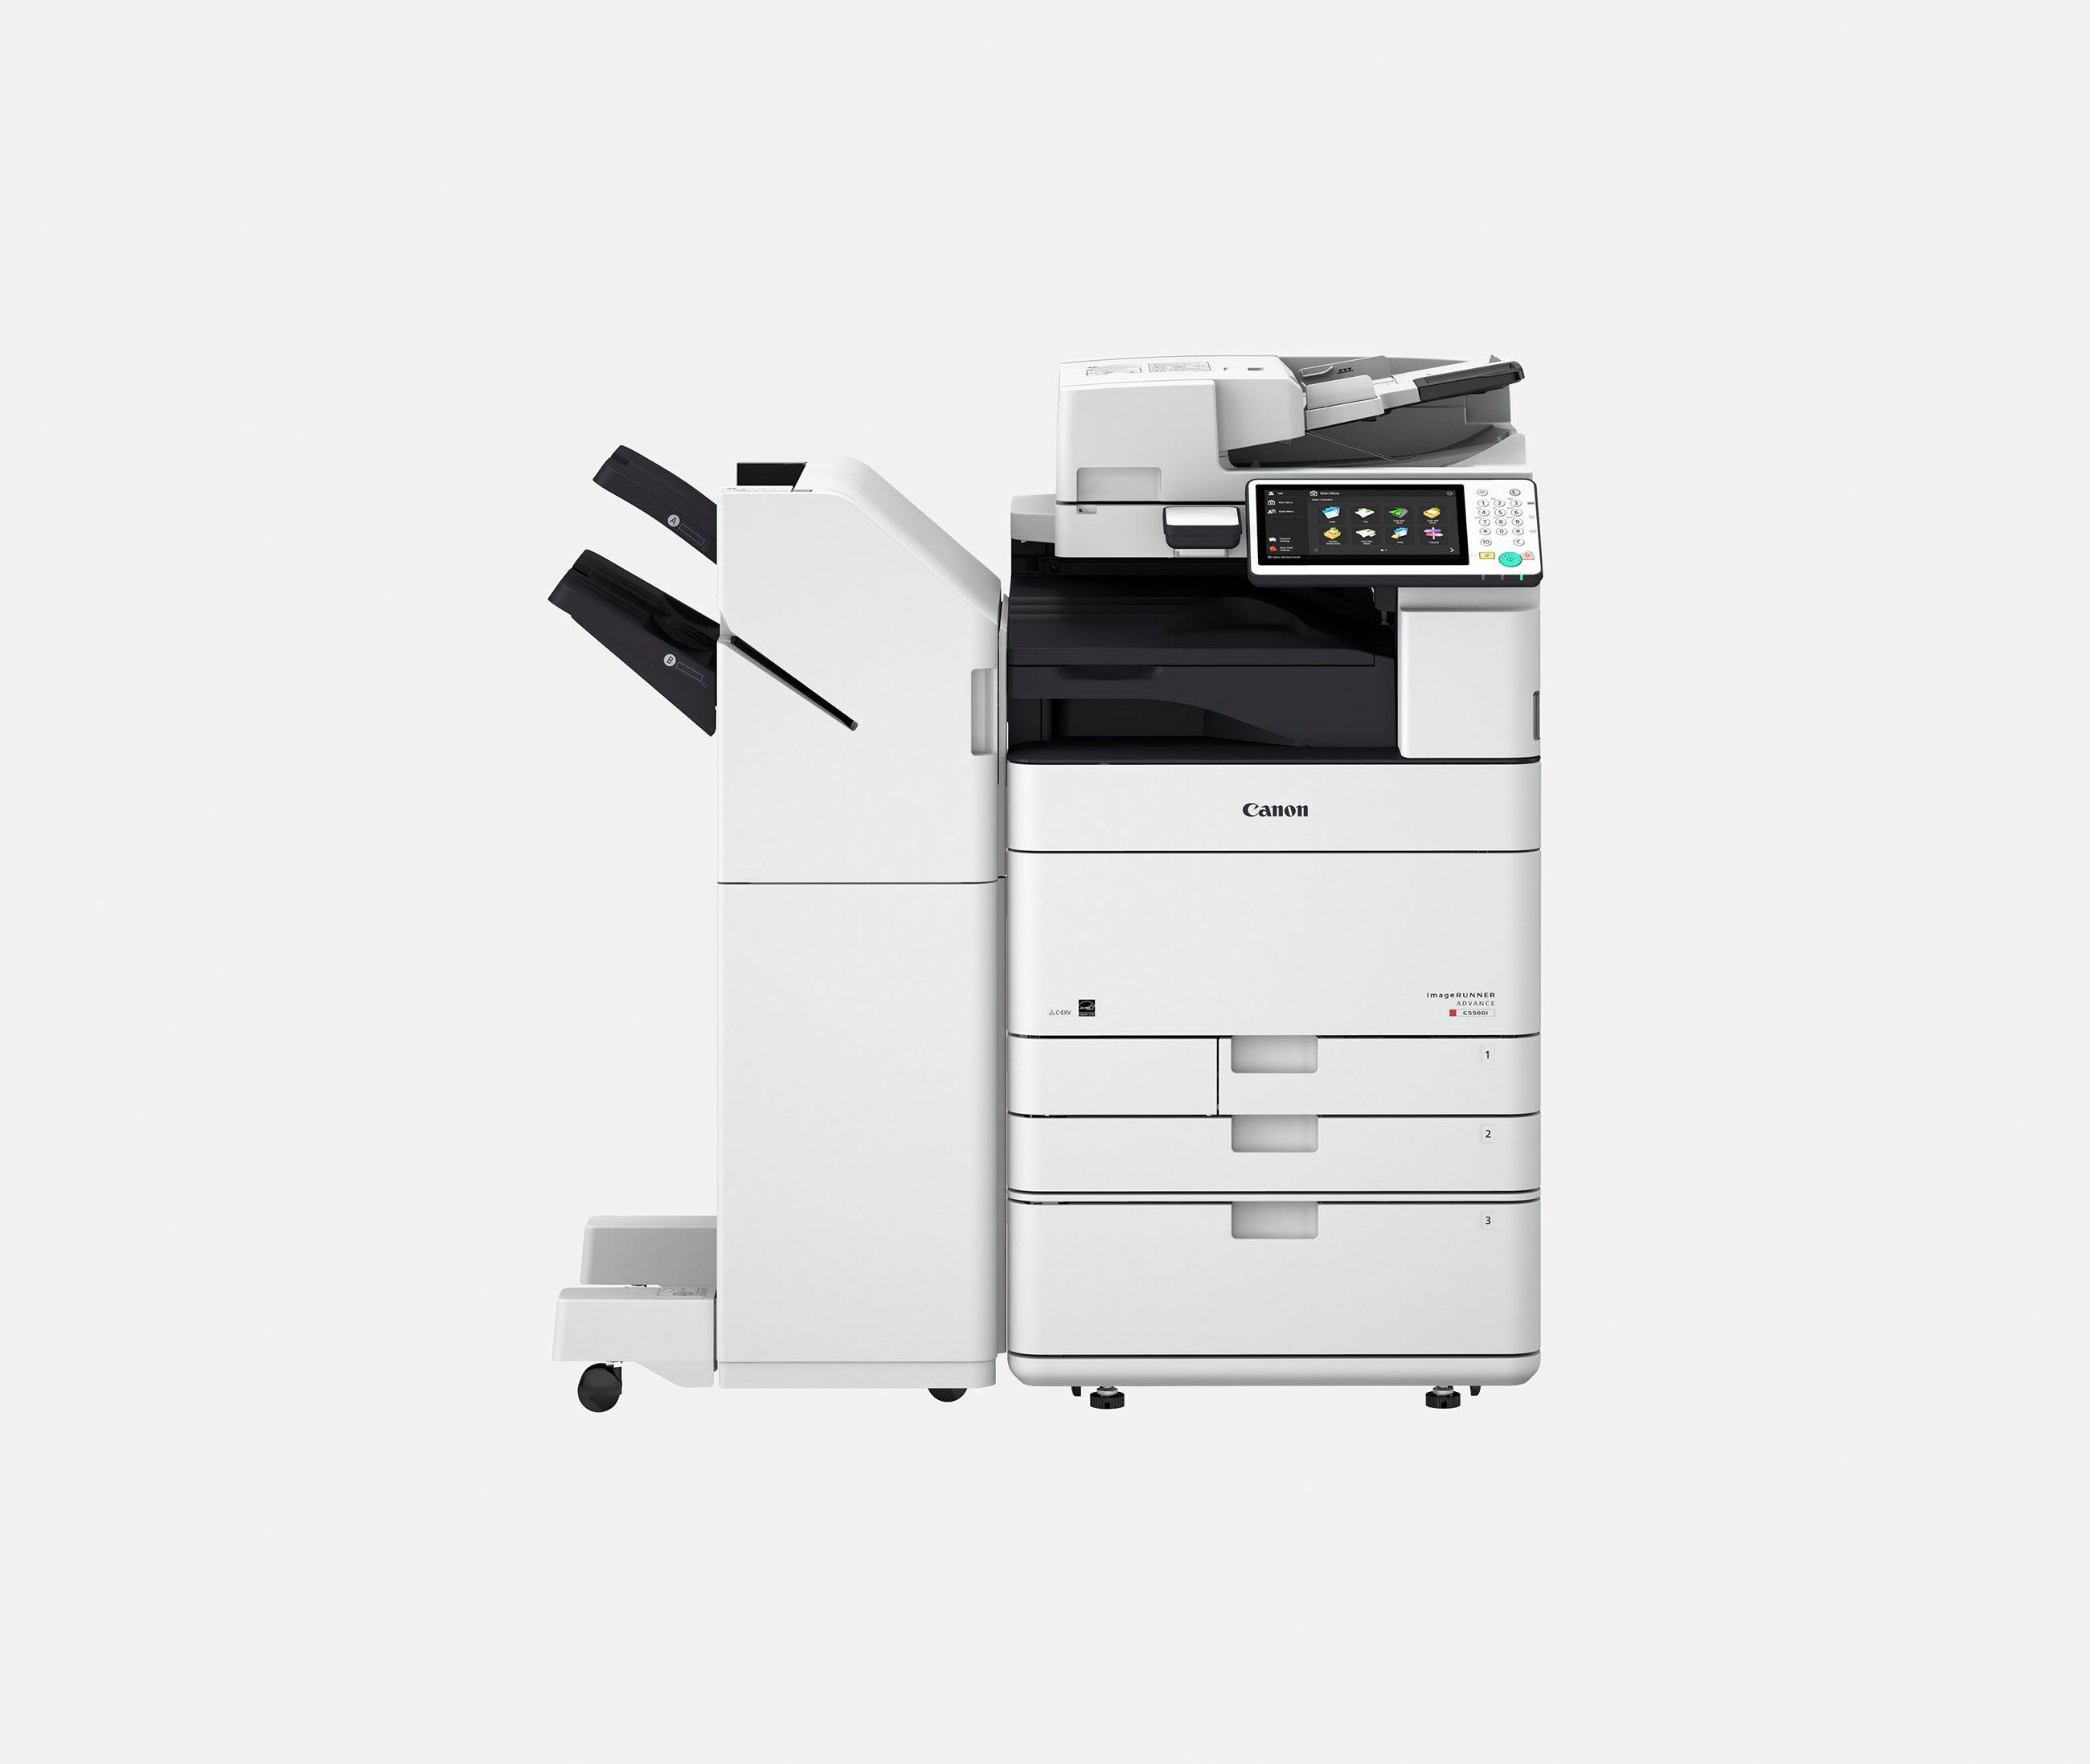 Canon imageRUNNER ADVANCE C5560i Multifunktionsdrucker